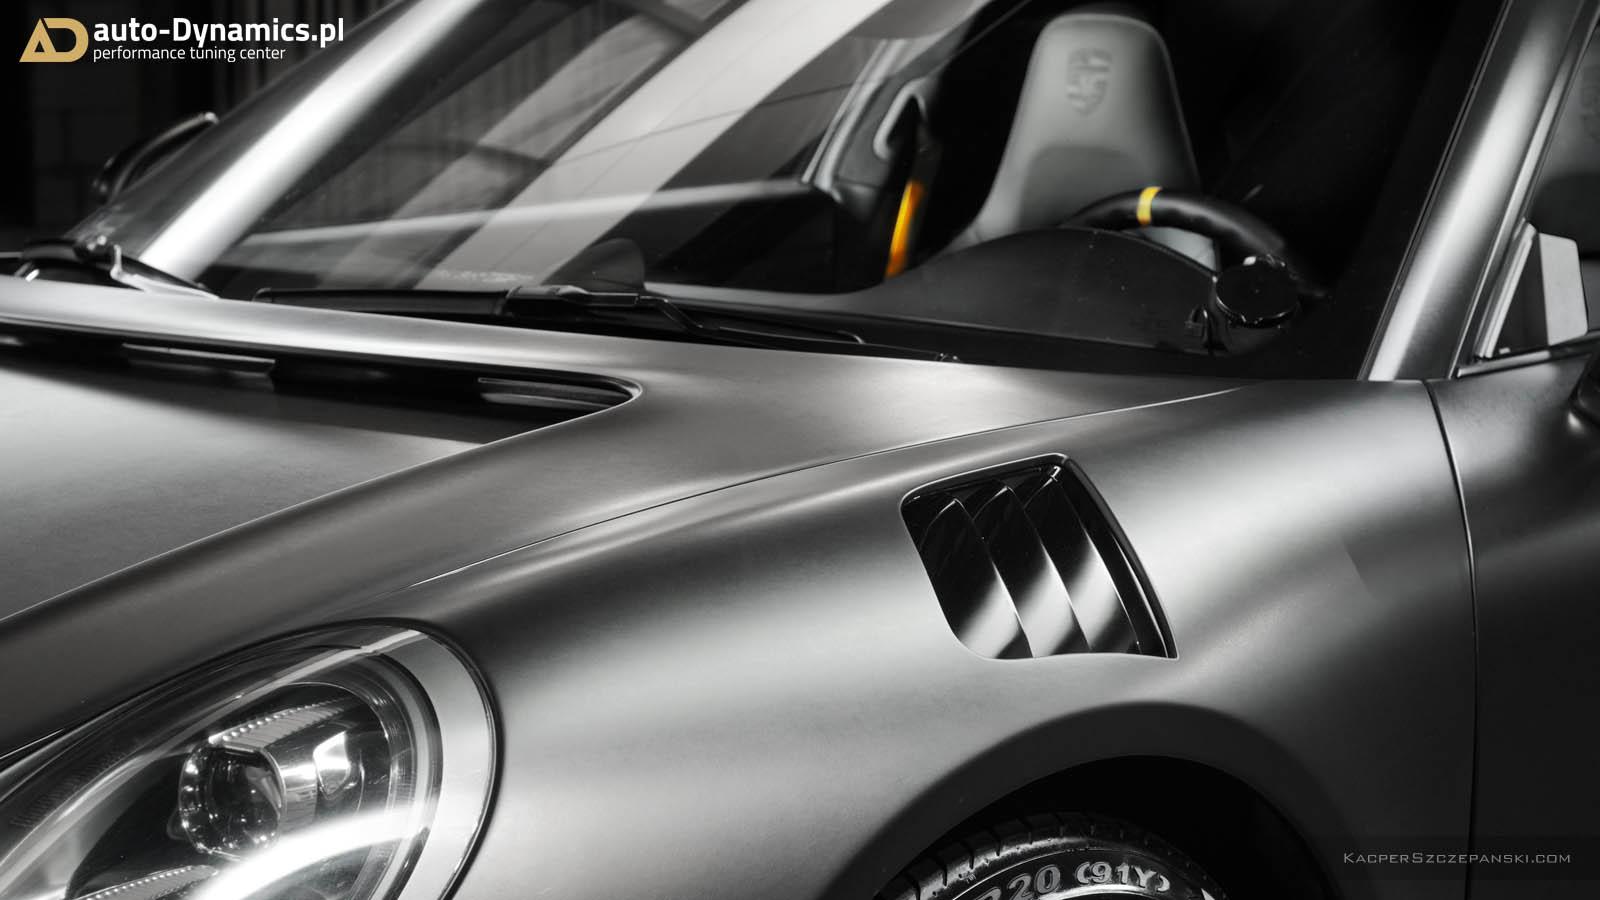 Porsche 911 Turbo S by Auto-Dynamics (10)